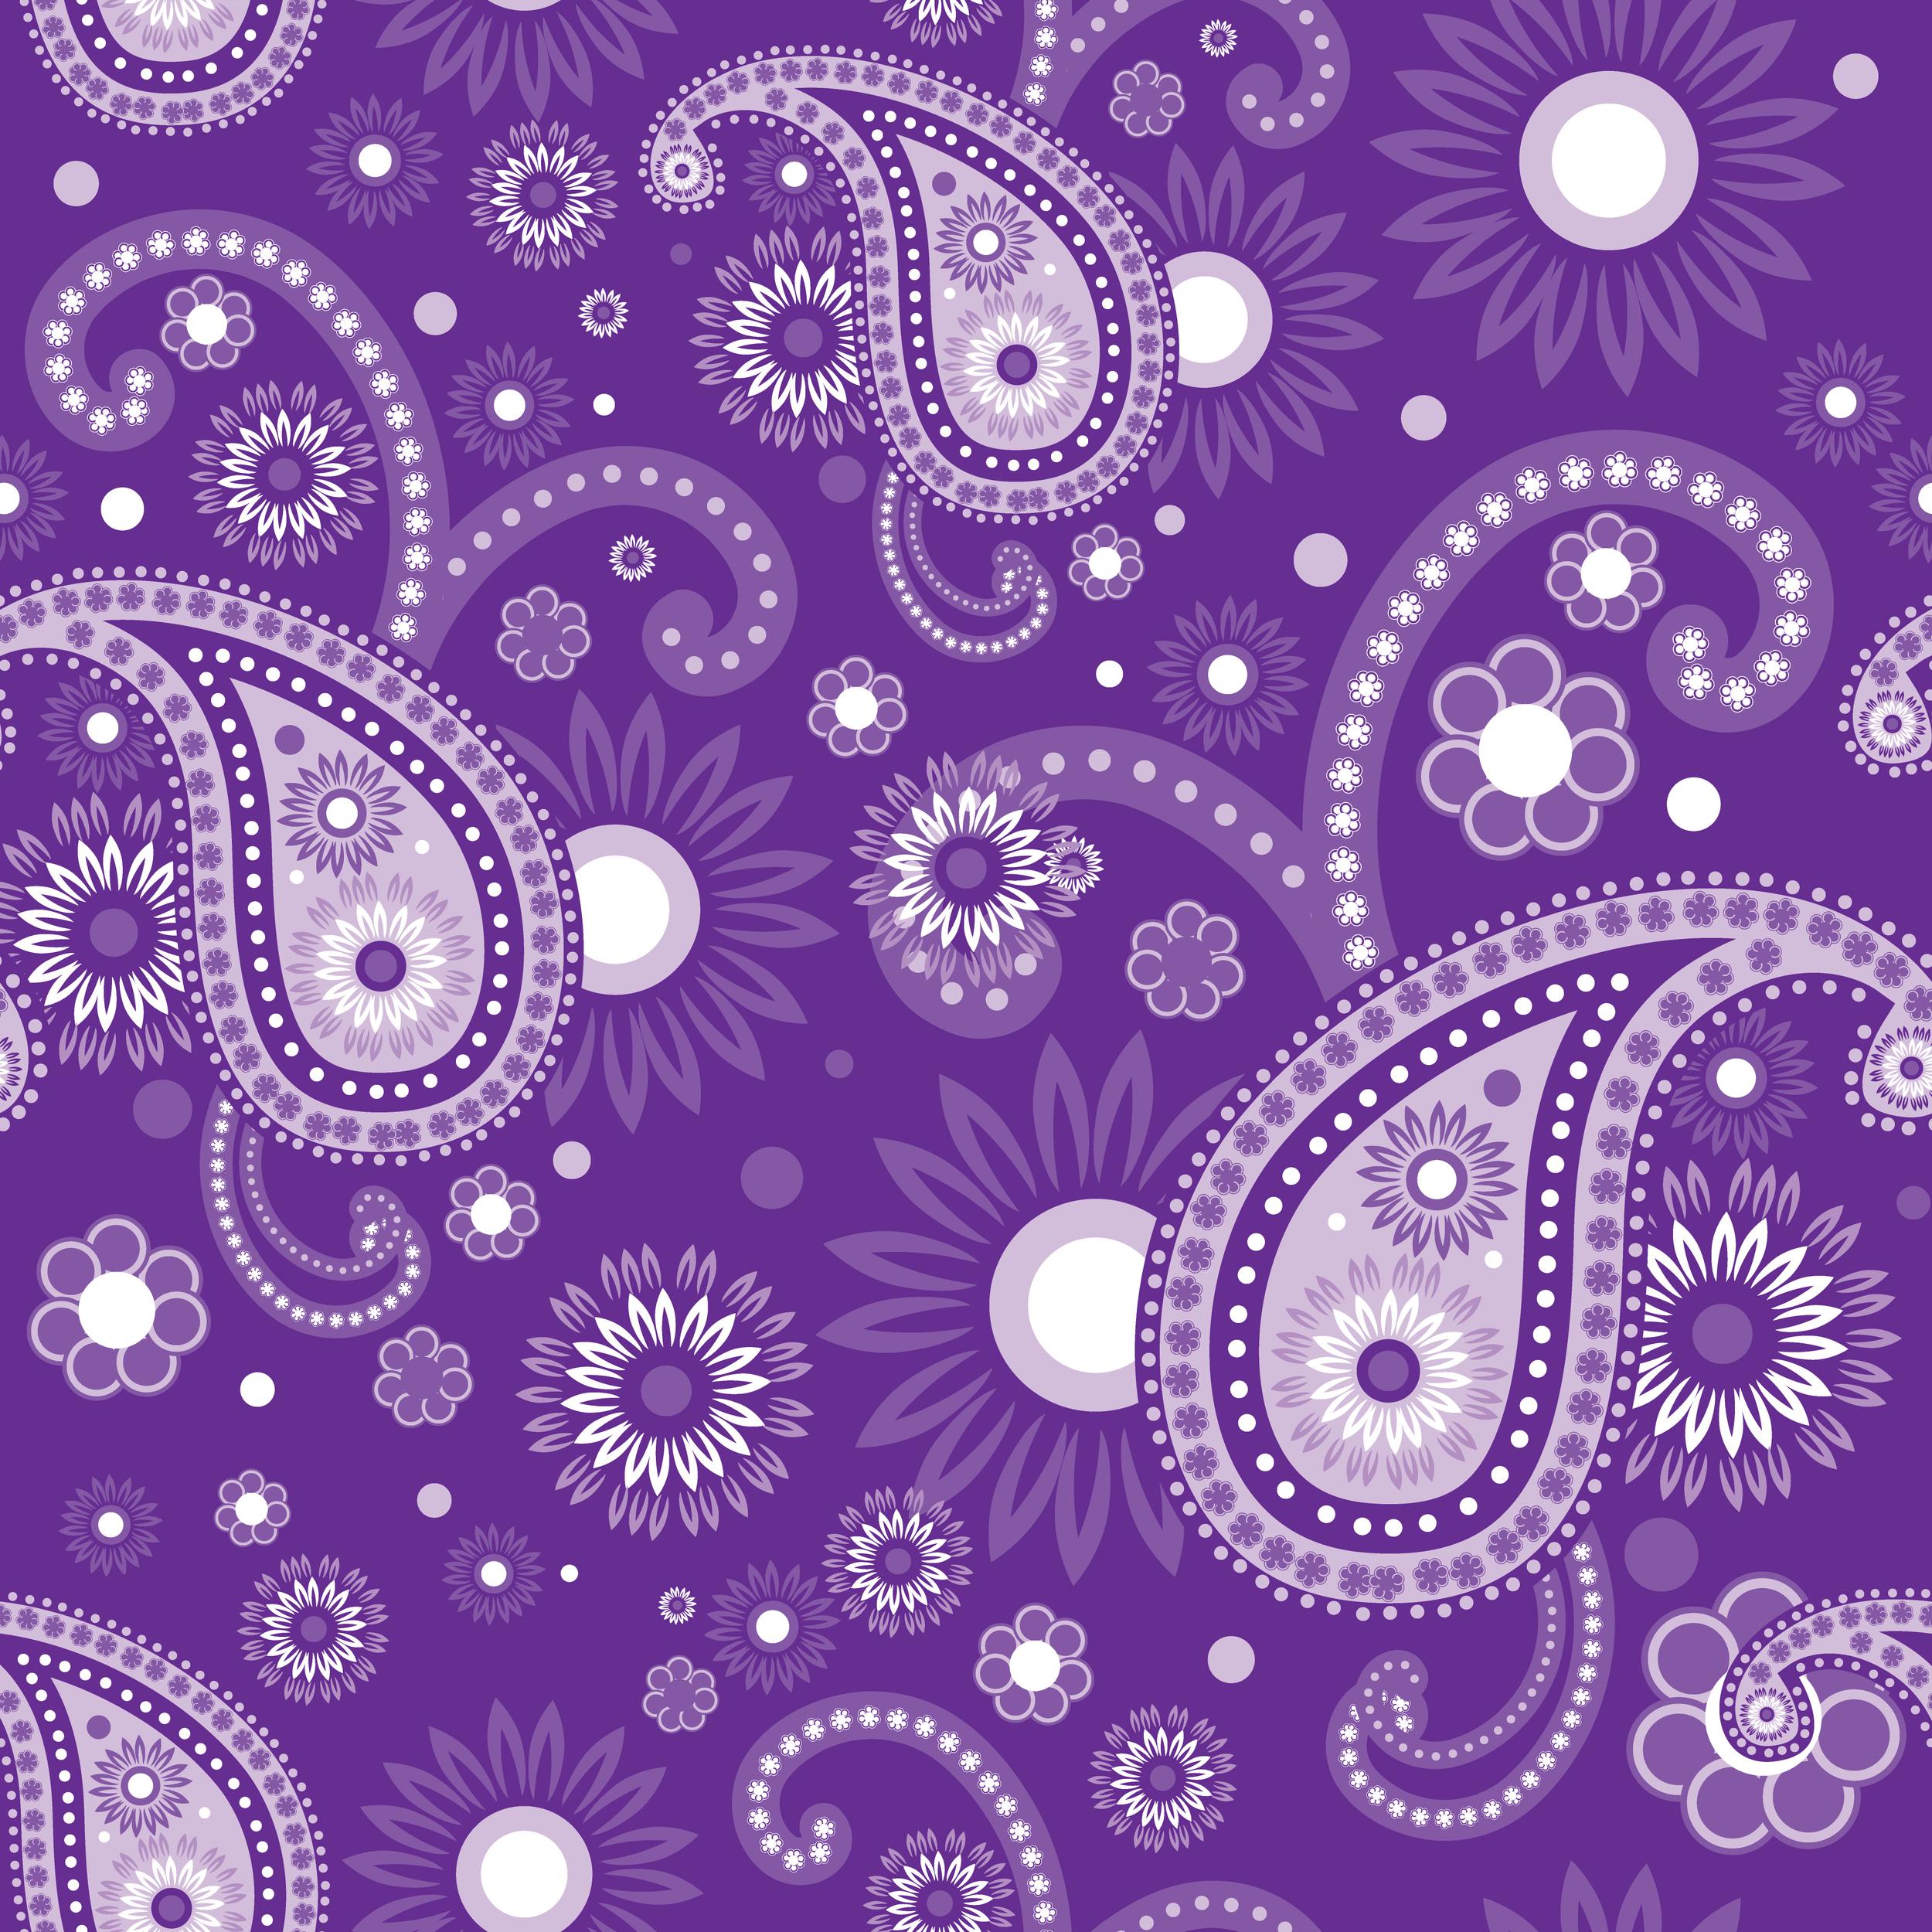 Purple_Paisley_Pale.jpg